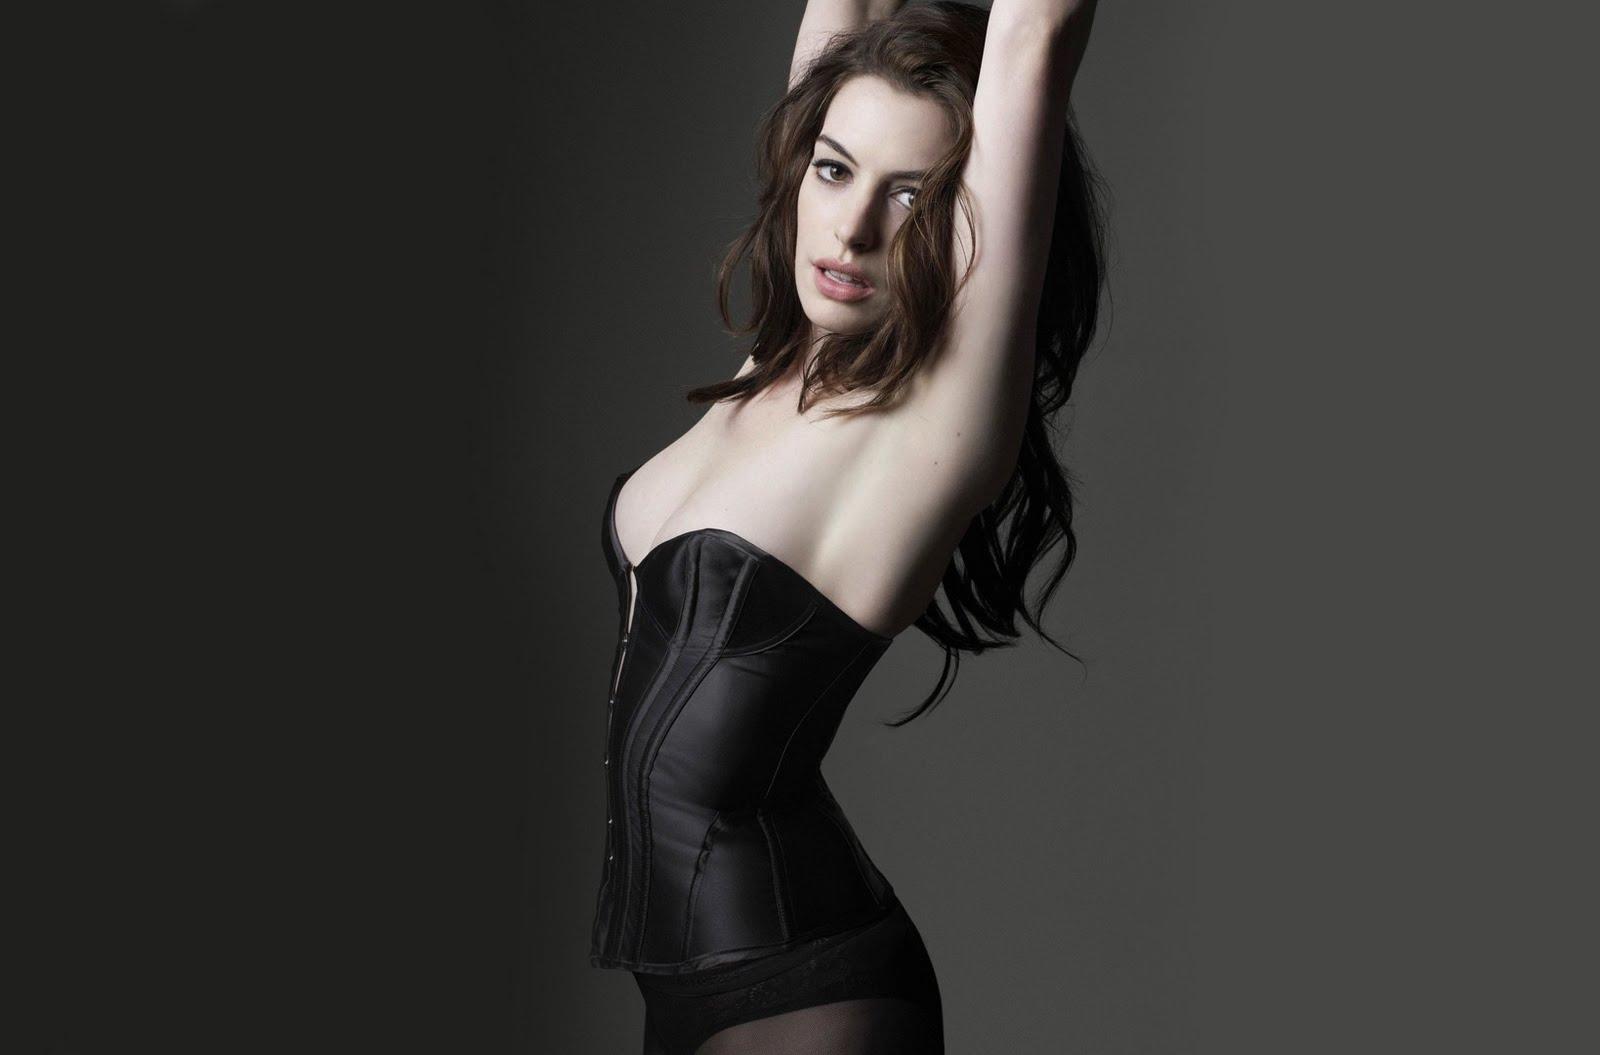 http://1.bp.blogspot.com/_eHkTwd4aRic/TUpy1fsHrEI/AAAAAAAAWjg/zL-7GwIP_Ns/s1600/anne-hathaway-catwoman1.jpg